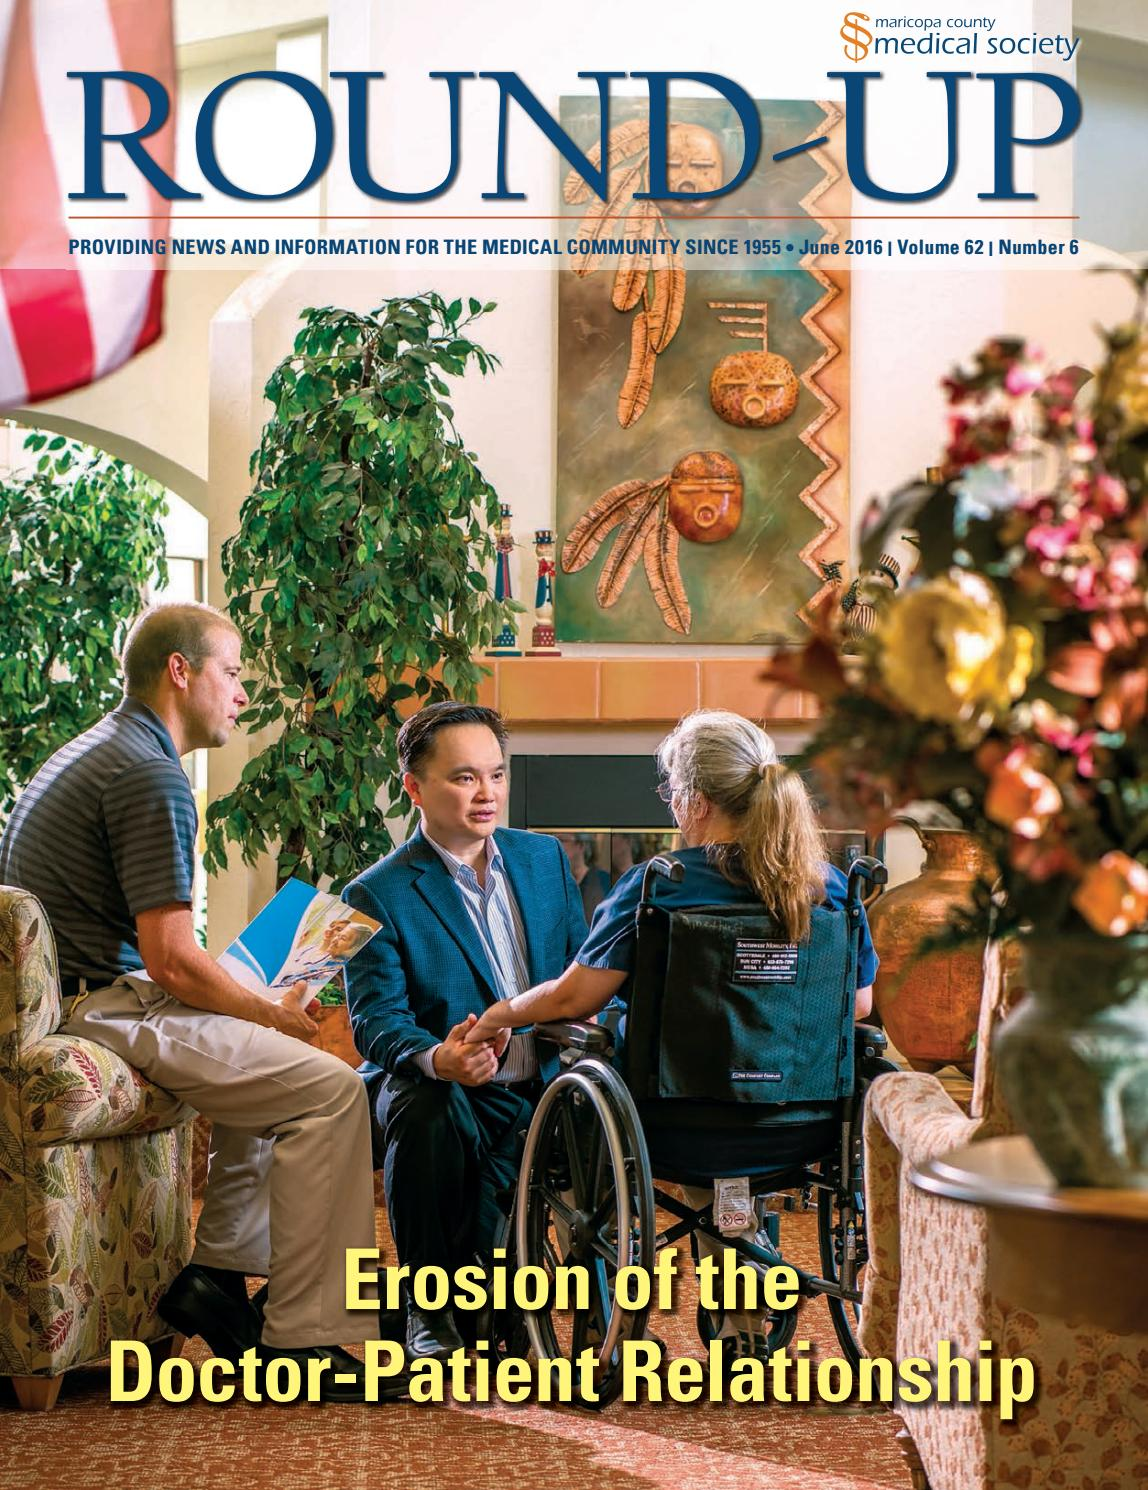 round up magazine 2016 by maricopa county medical society round up magazine 2016